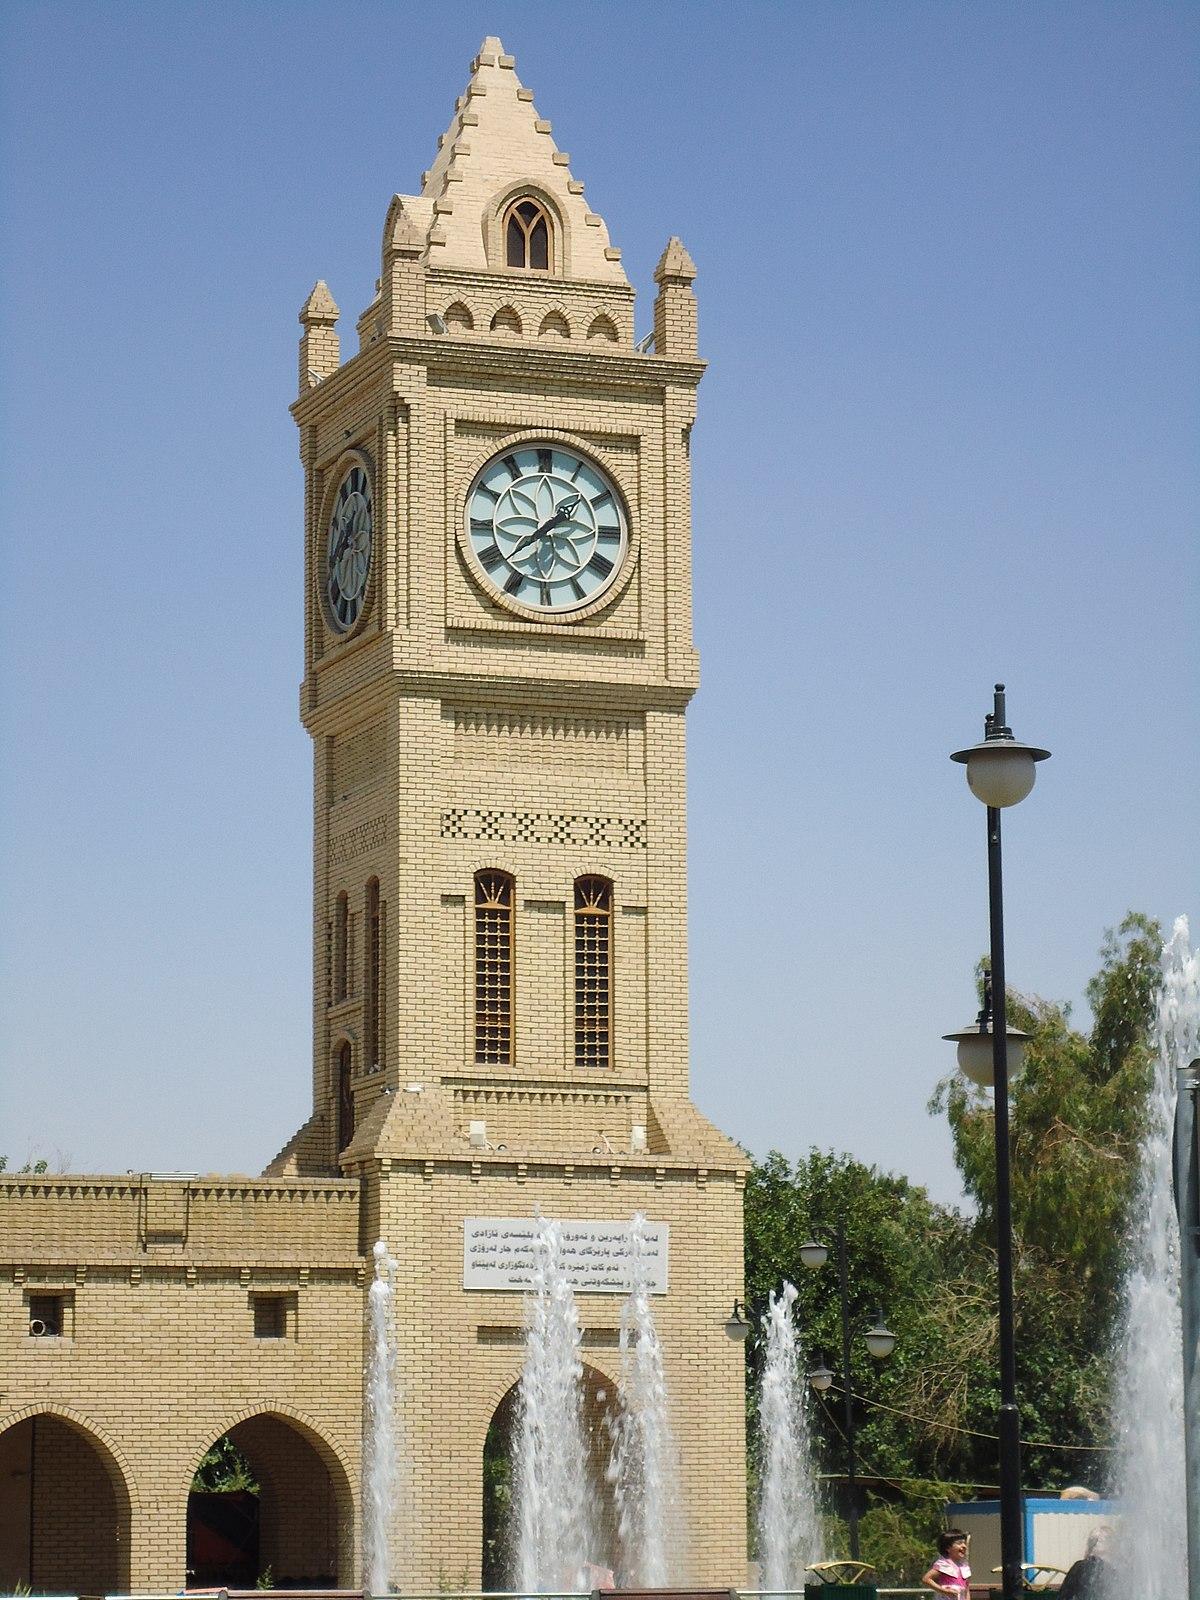 Clock tower - Wikipedia